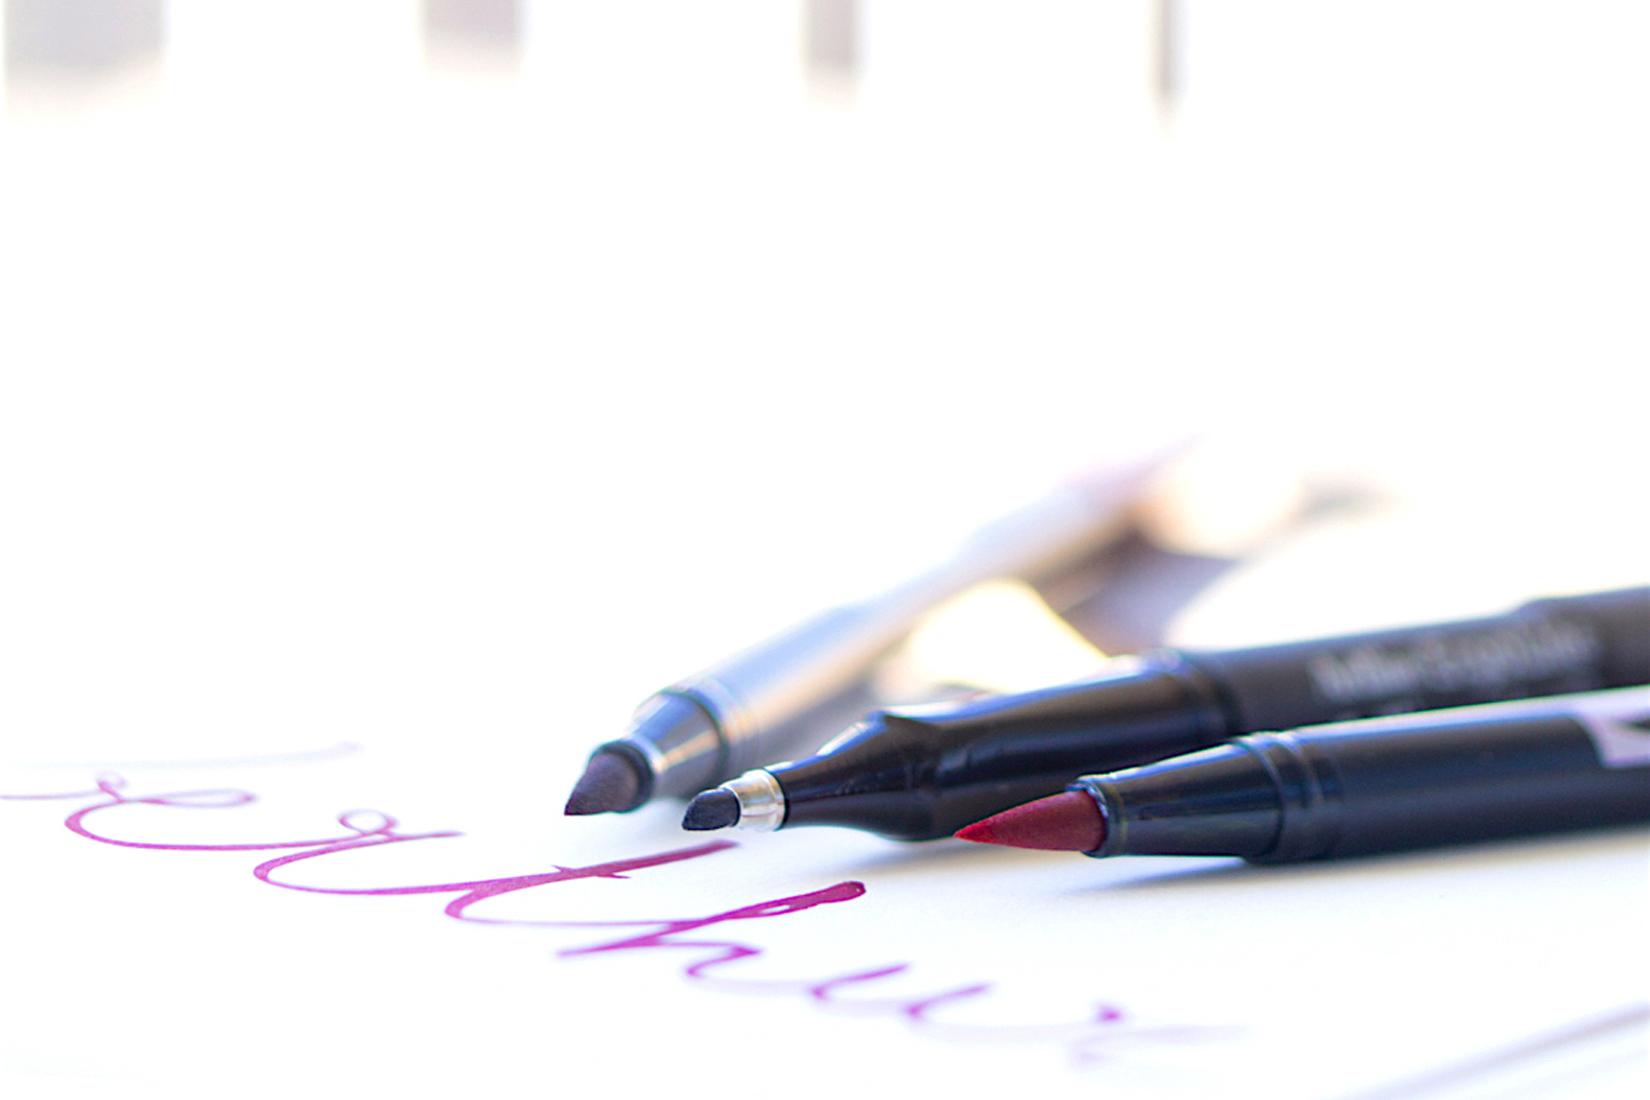 focus-materiel-stylo-brushpen-rose-violet-noir-calligraphie-hand lettering-tutoriel-oberthur-blog-rennes-lifestyle